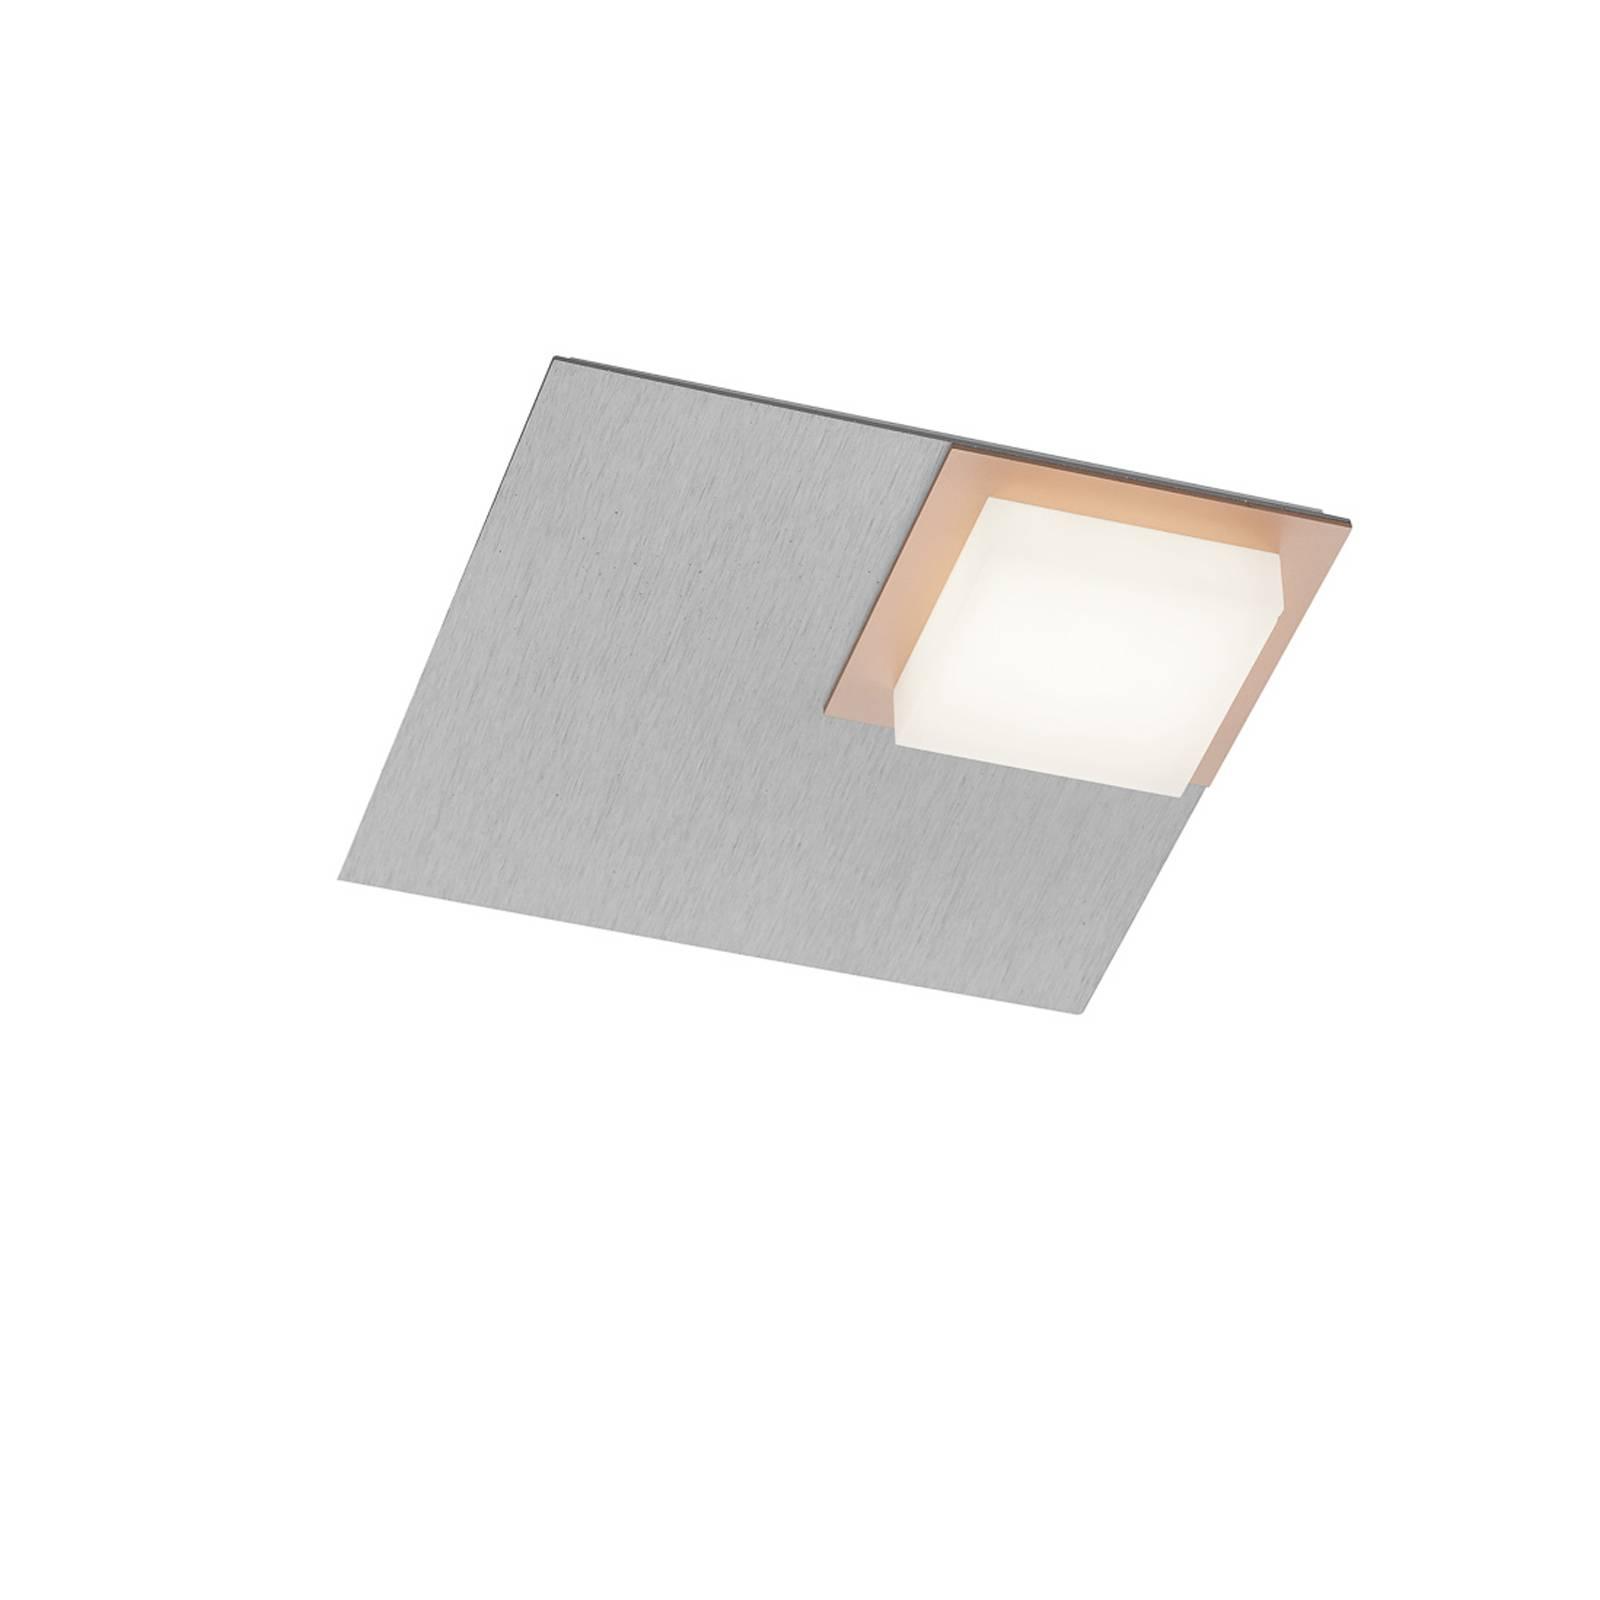 BANKAMP Quadro LED-kattovalaisin 8W hopea